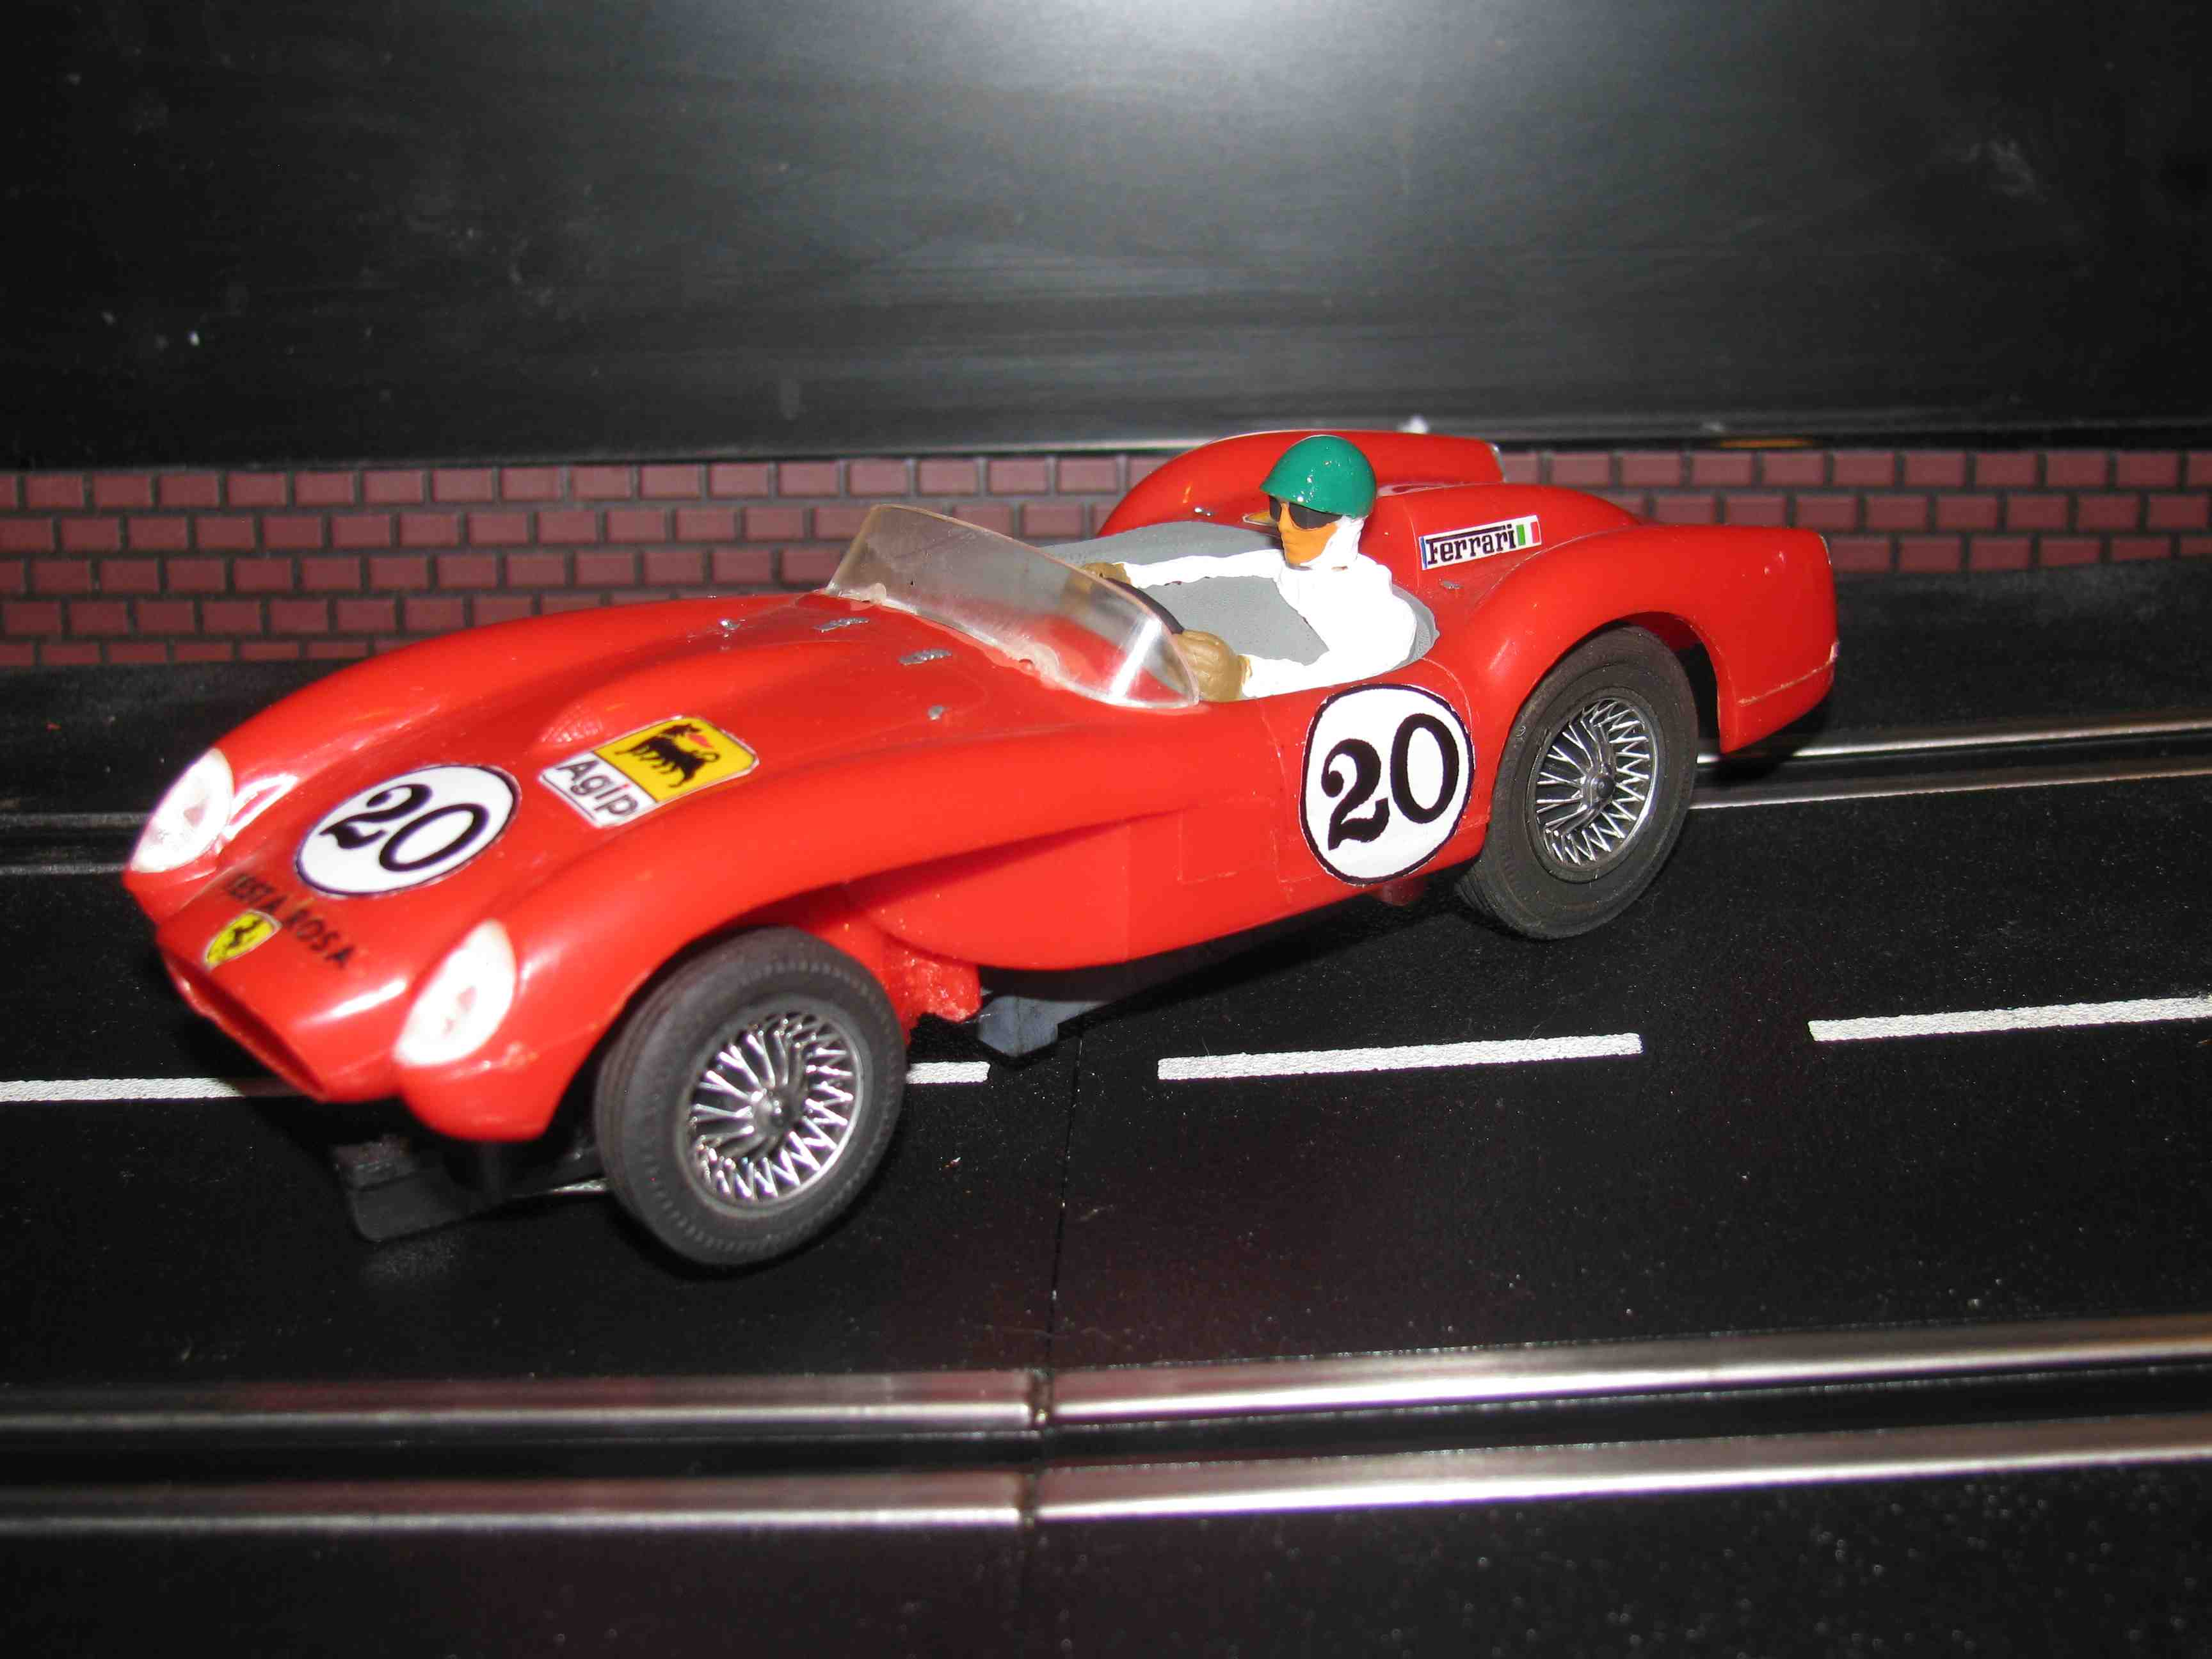 * SOLD * Vintage Eldon Ferrari Testa Rosa Slot Car 1/32 Scale